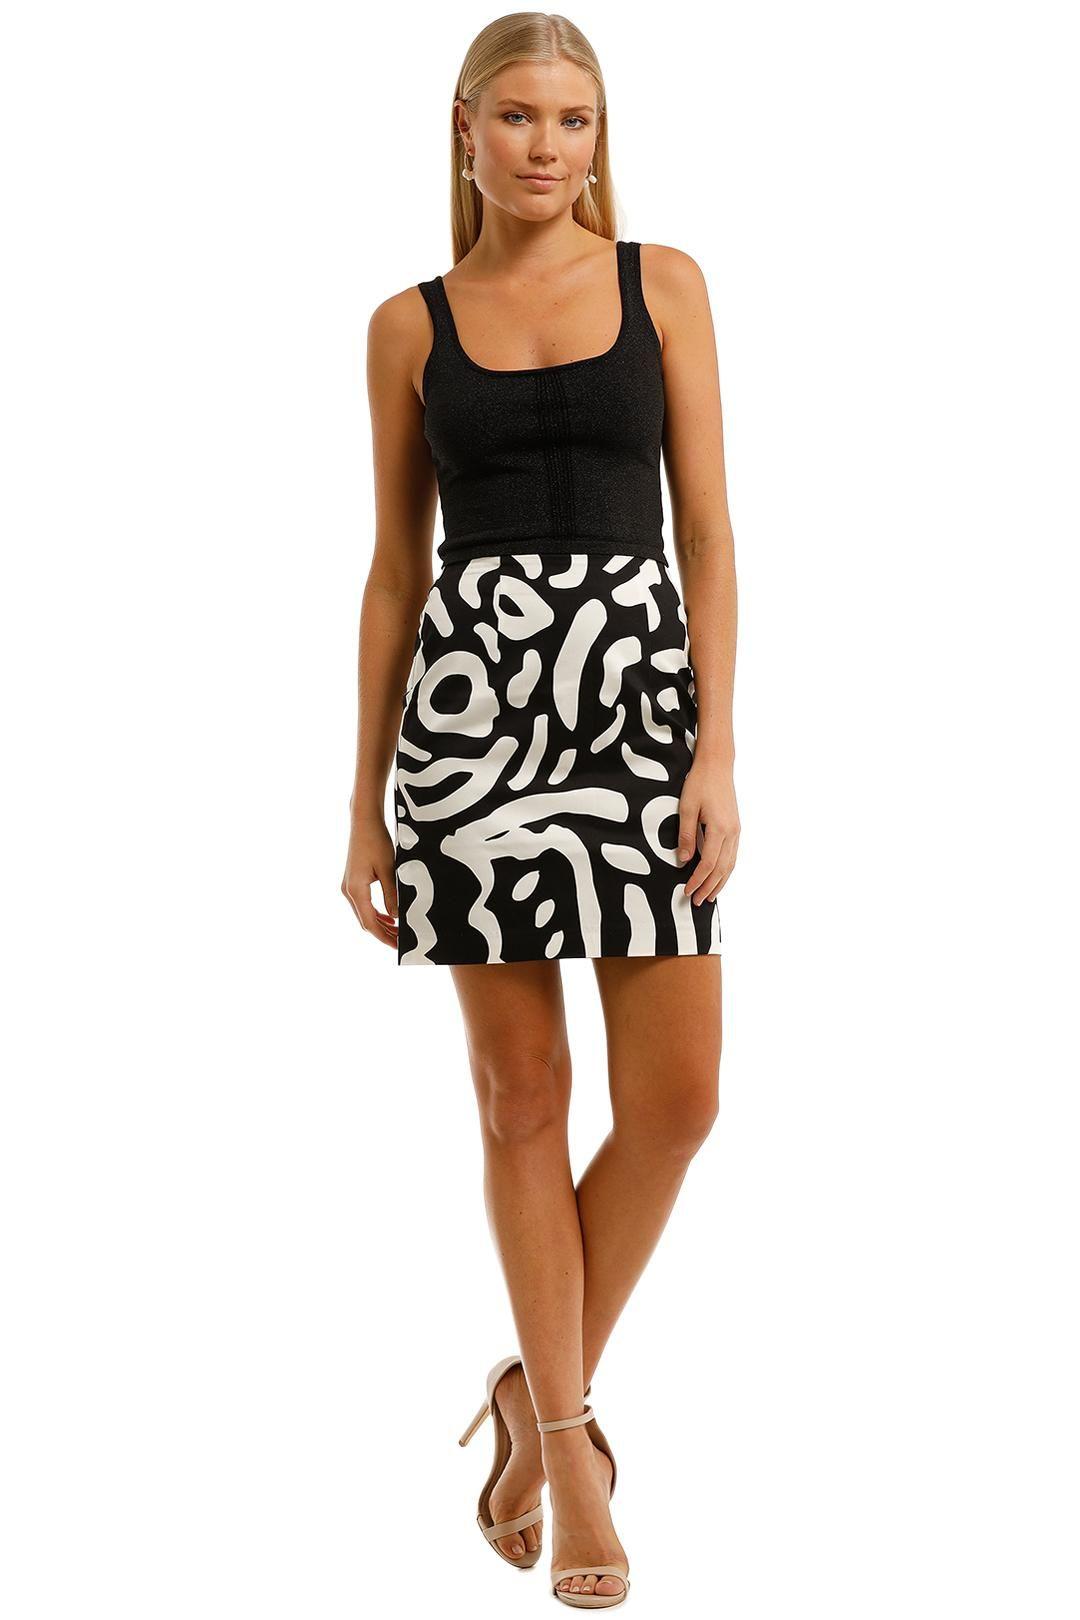 Gorman Ripple Effect Mini Skirt High Waisted